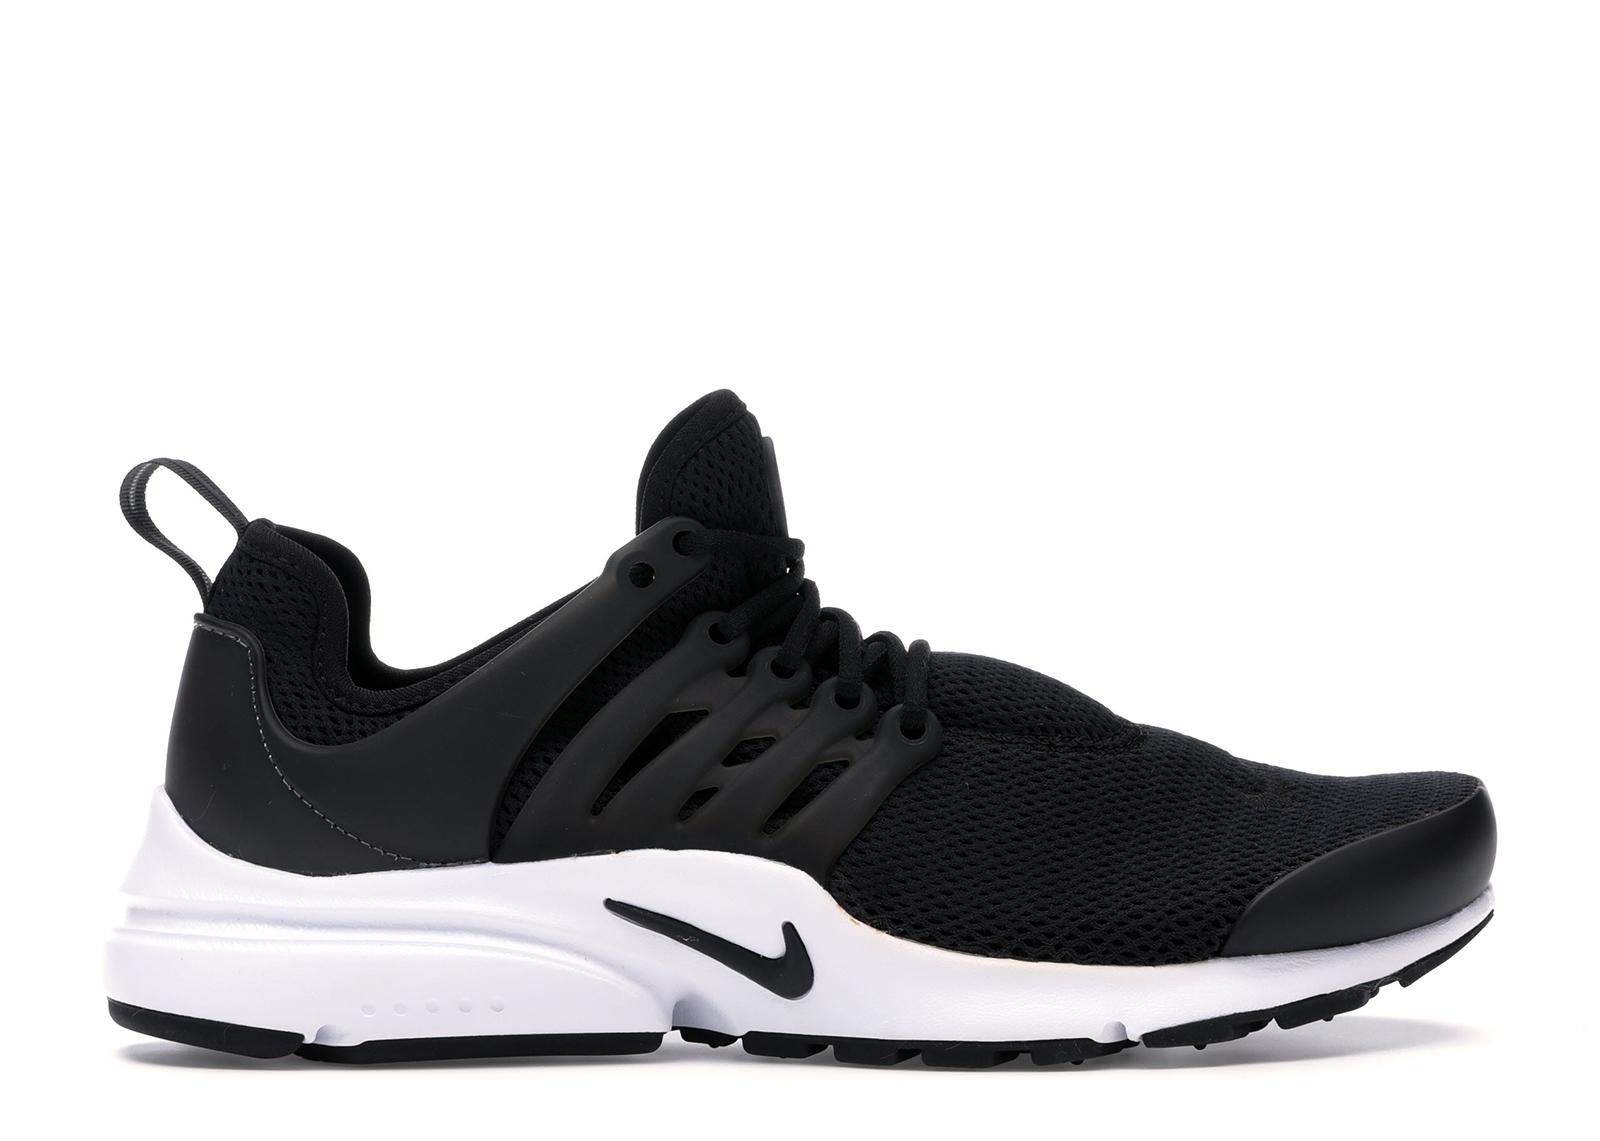 Nike Air Presto Black White (W) - 878068-001